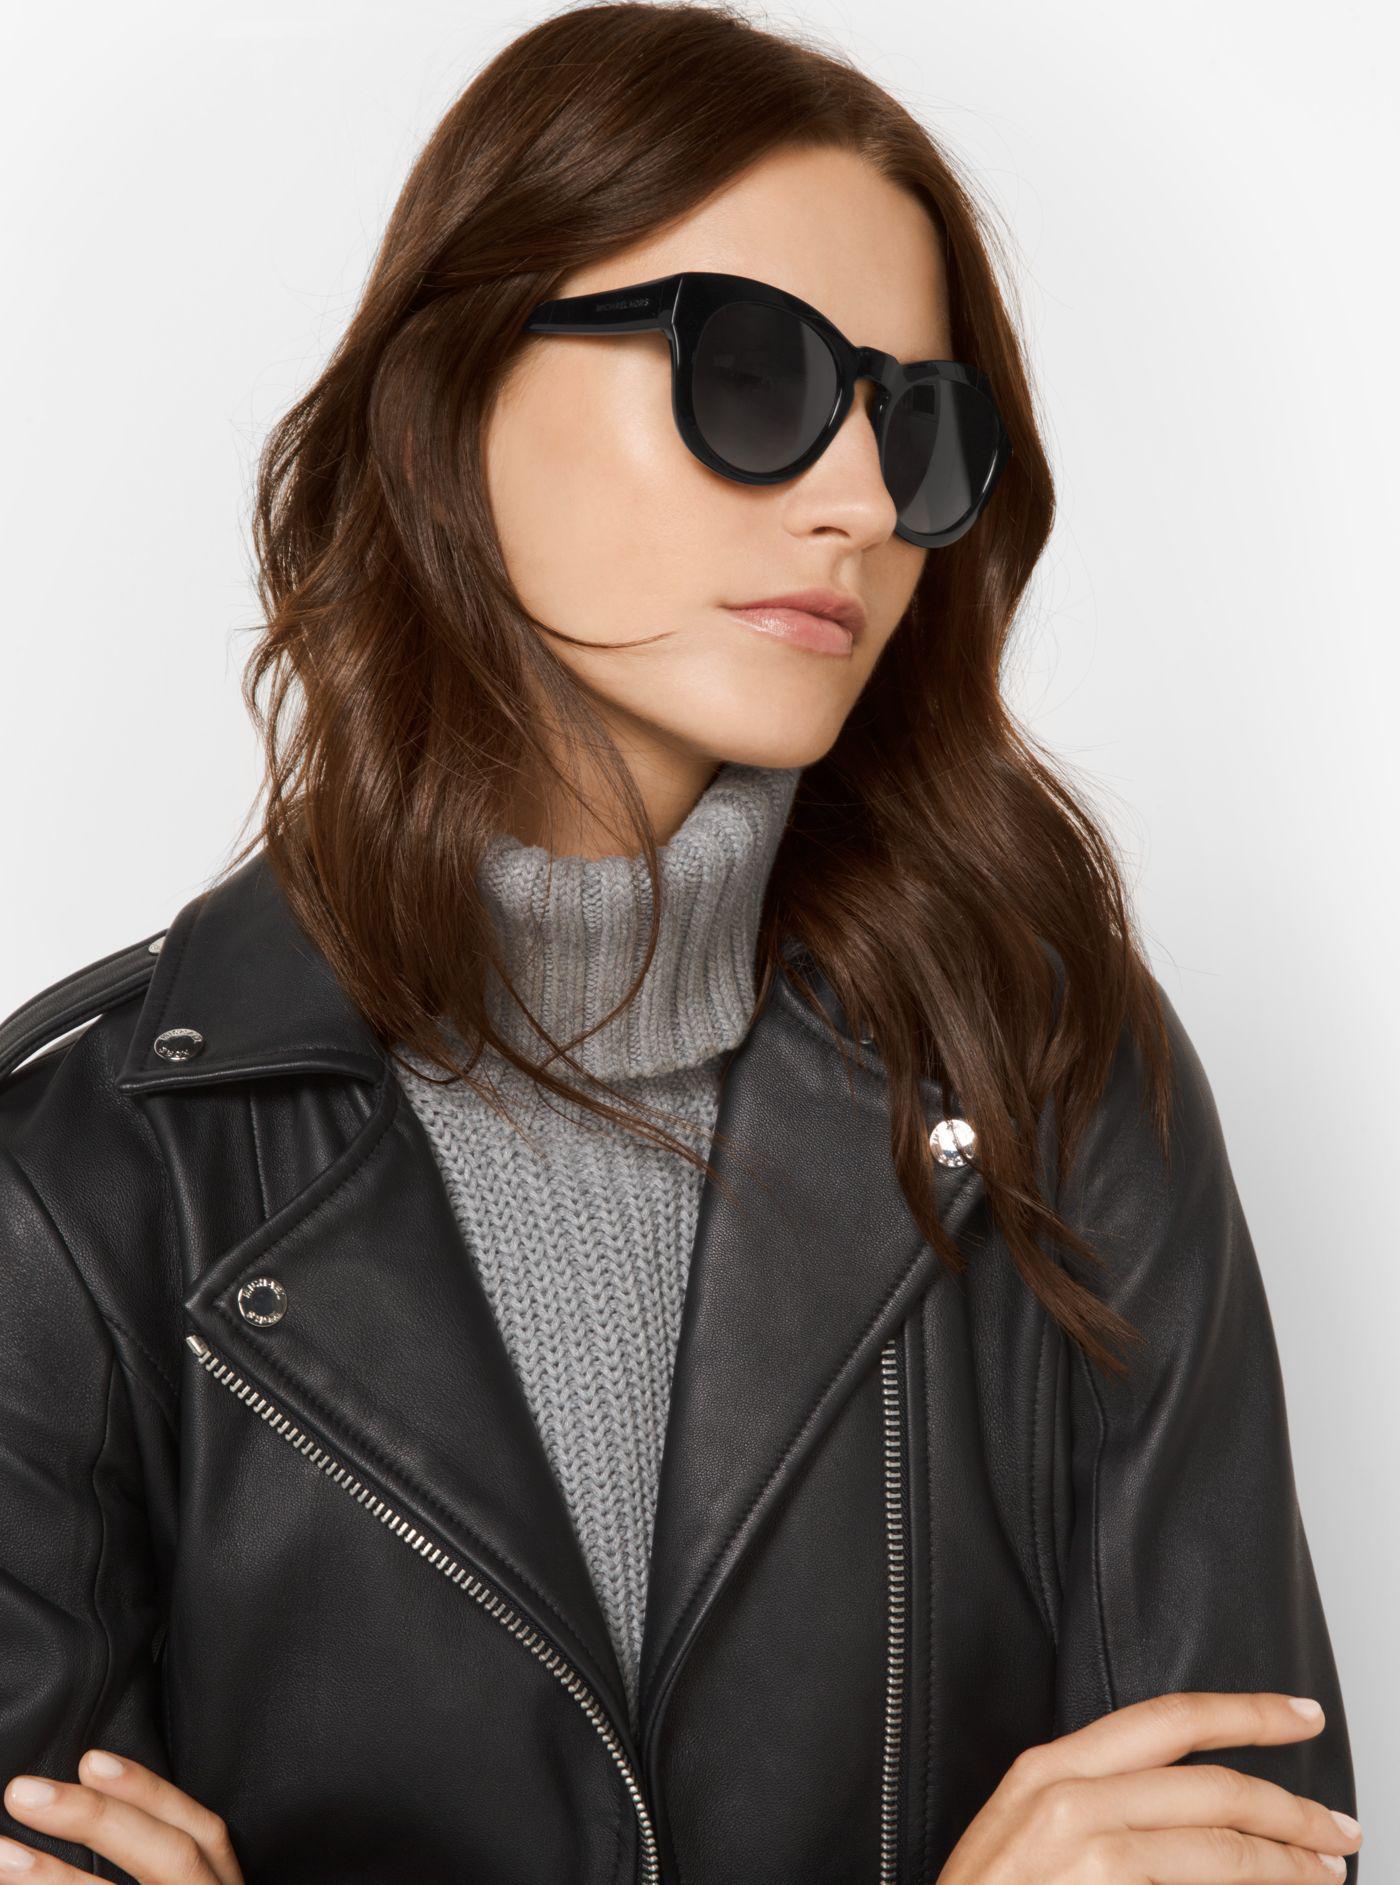 fc83cf64b3 Michael Kors - Black Summer Breeze Sunglasses - Lyst. View fullscreen